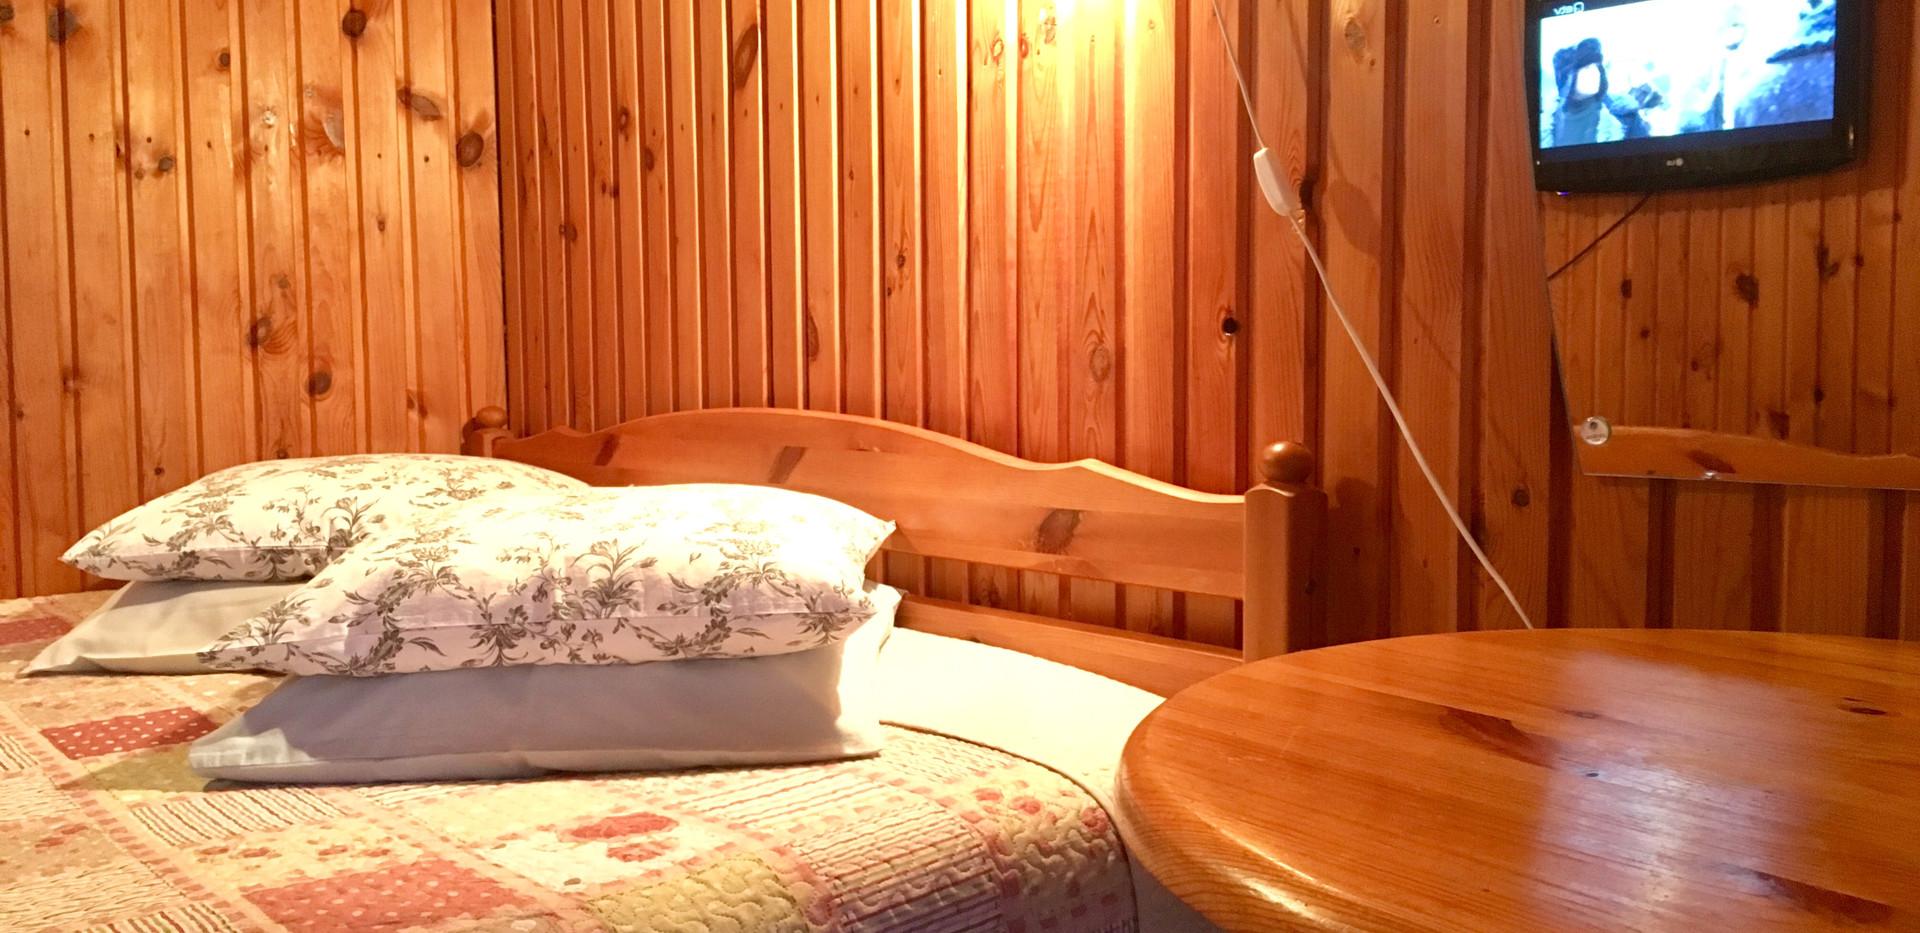 Tuba nr 3 - Külalistemaja Kikas